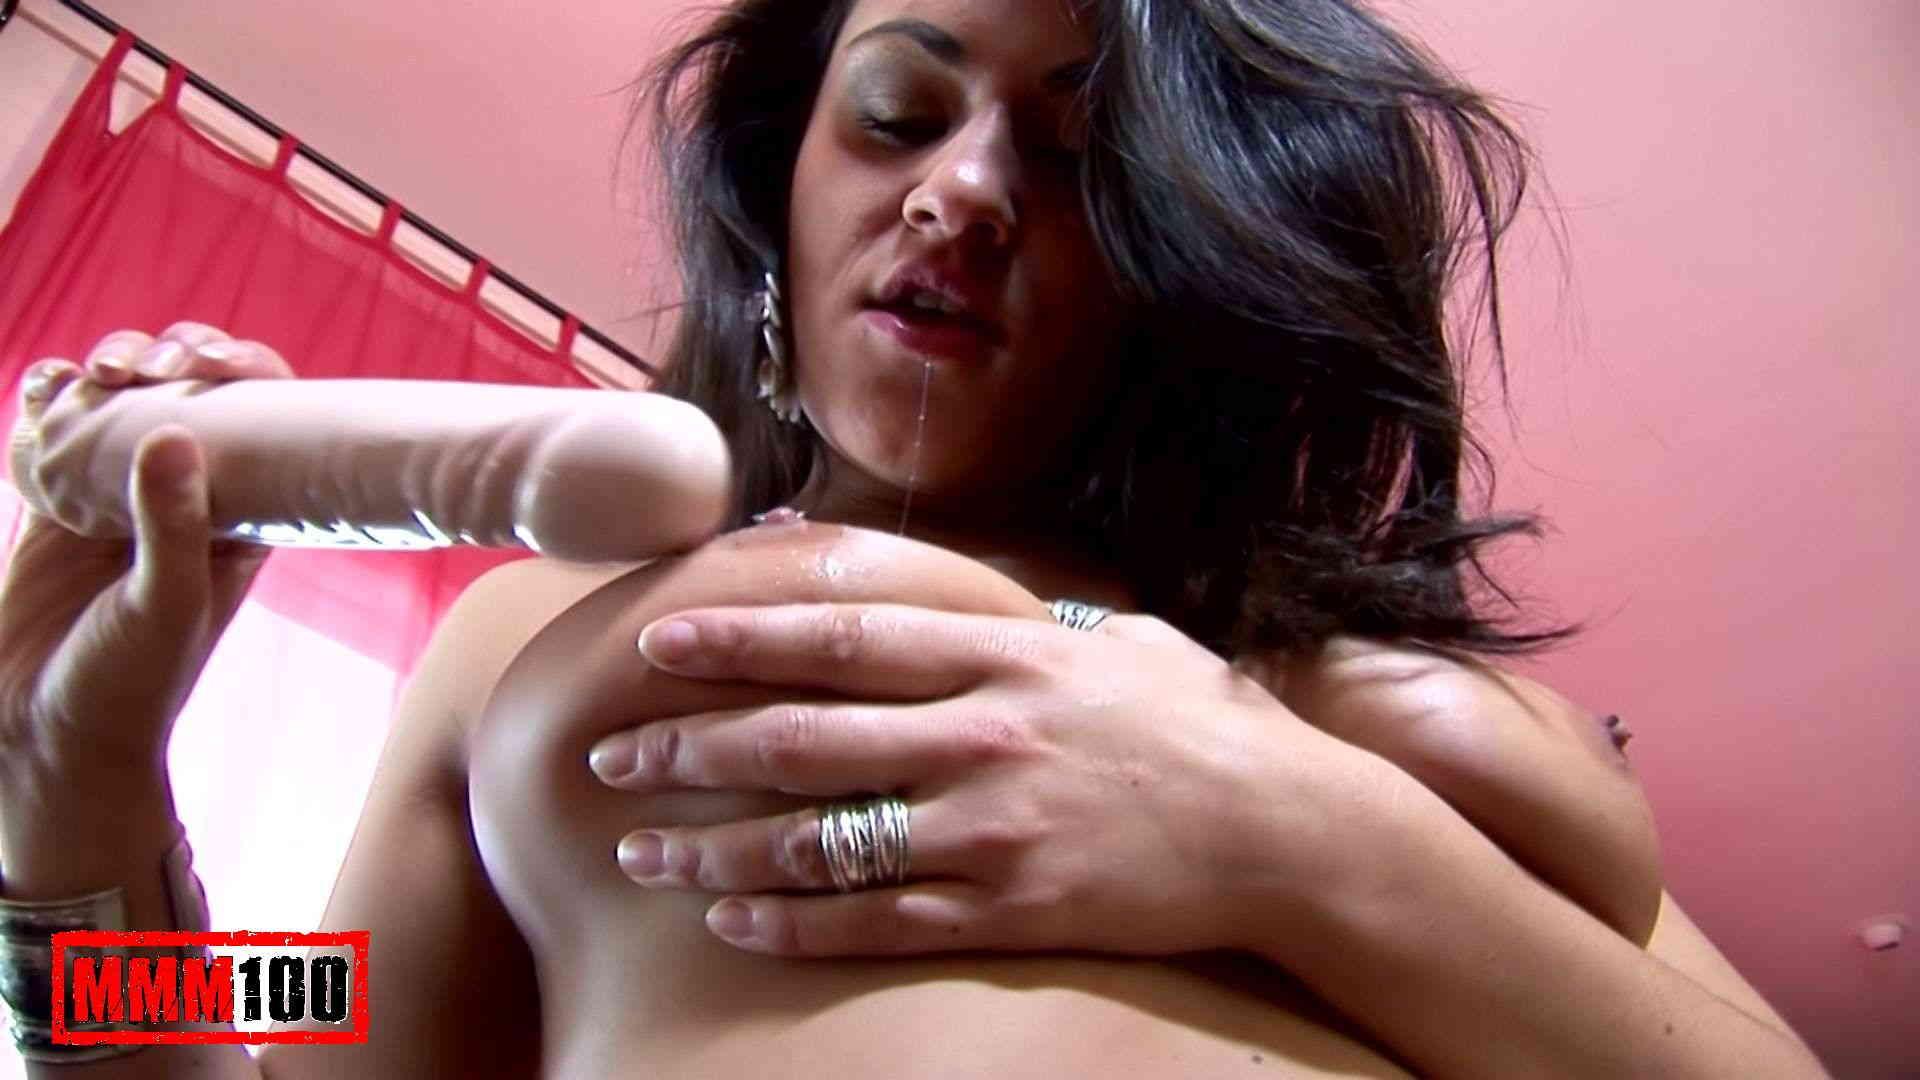 List of Latina porn stars - Boobpedia -